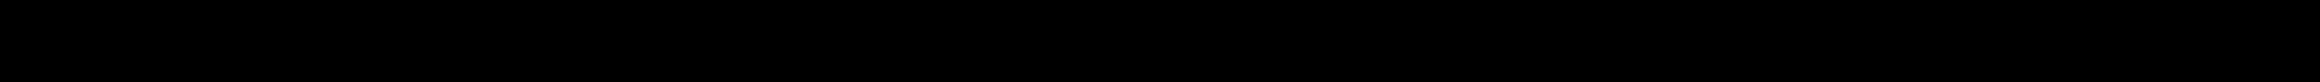 NGK I83, J 4520 IUF 22, 99000-69835-C7R, 99000-79A37-U2F, 99000-79K24-F22 Zündkerze